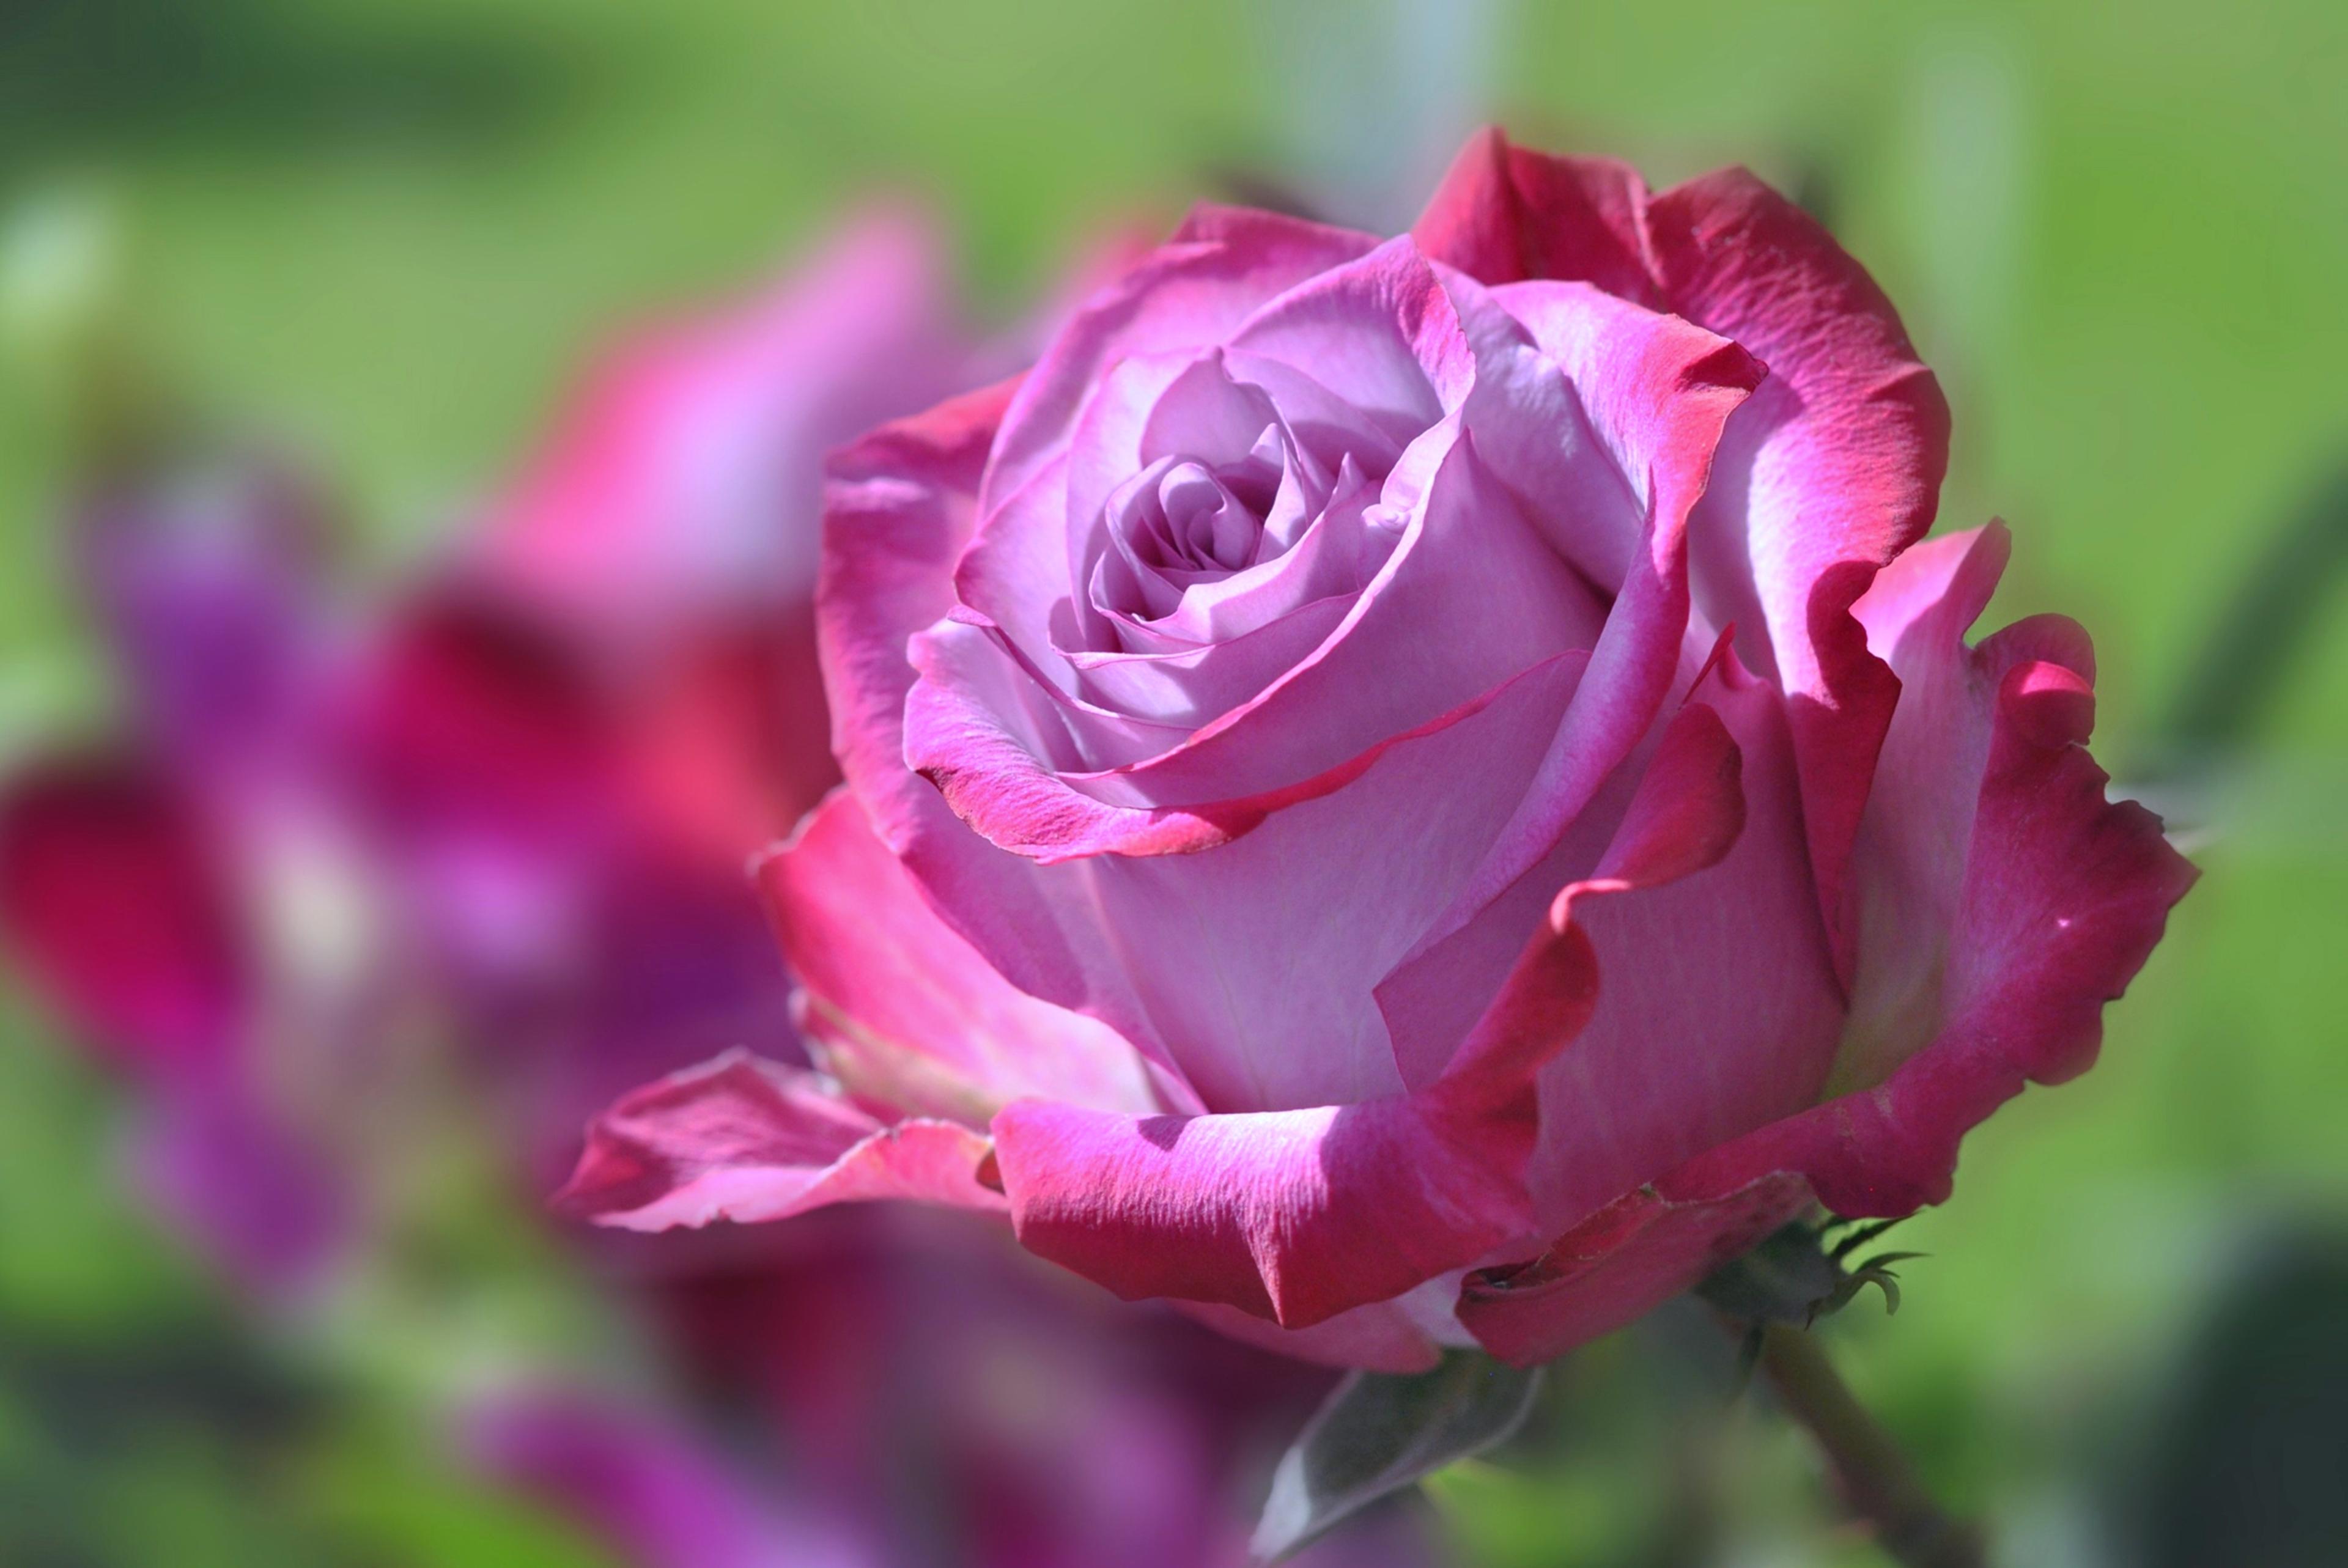 Beautiful rose 4k ultra hd wallpaper background image - Big rose flower wallpaper ...